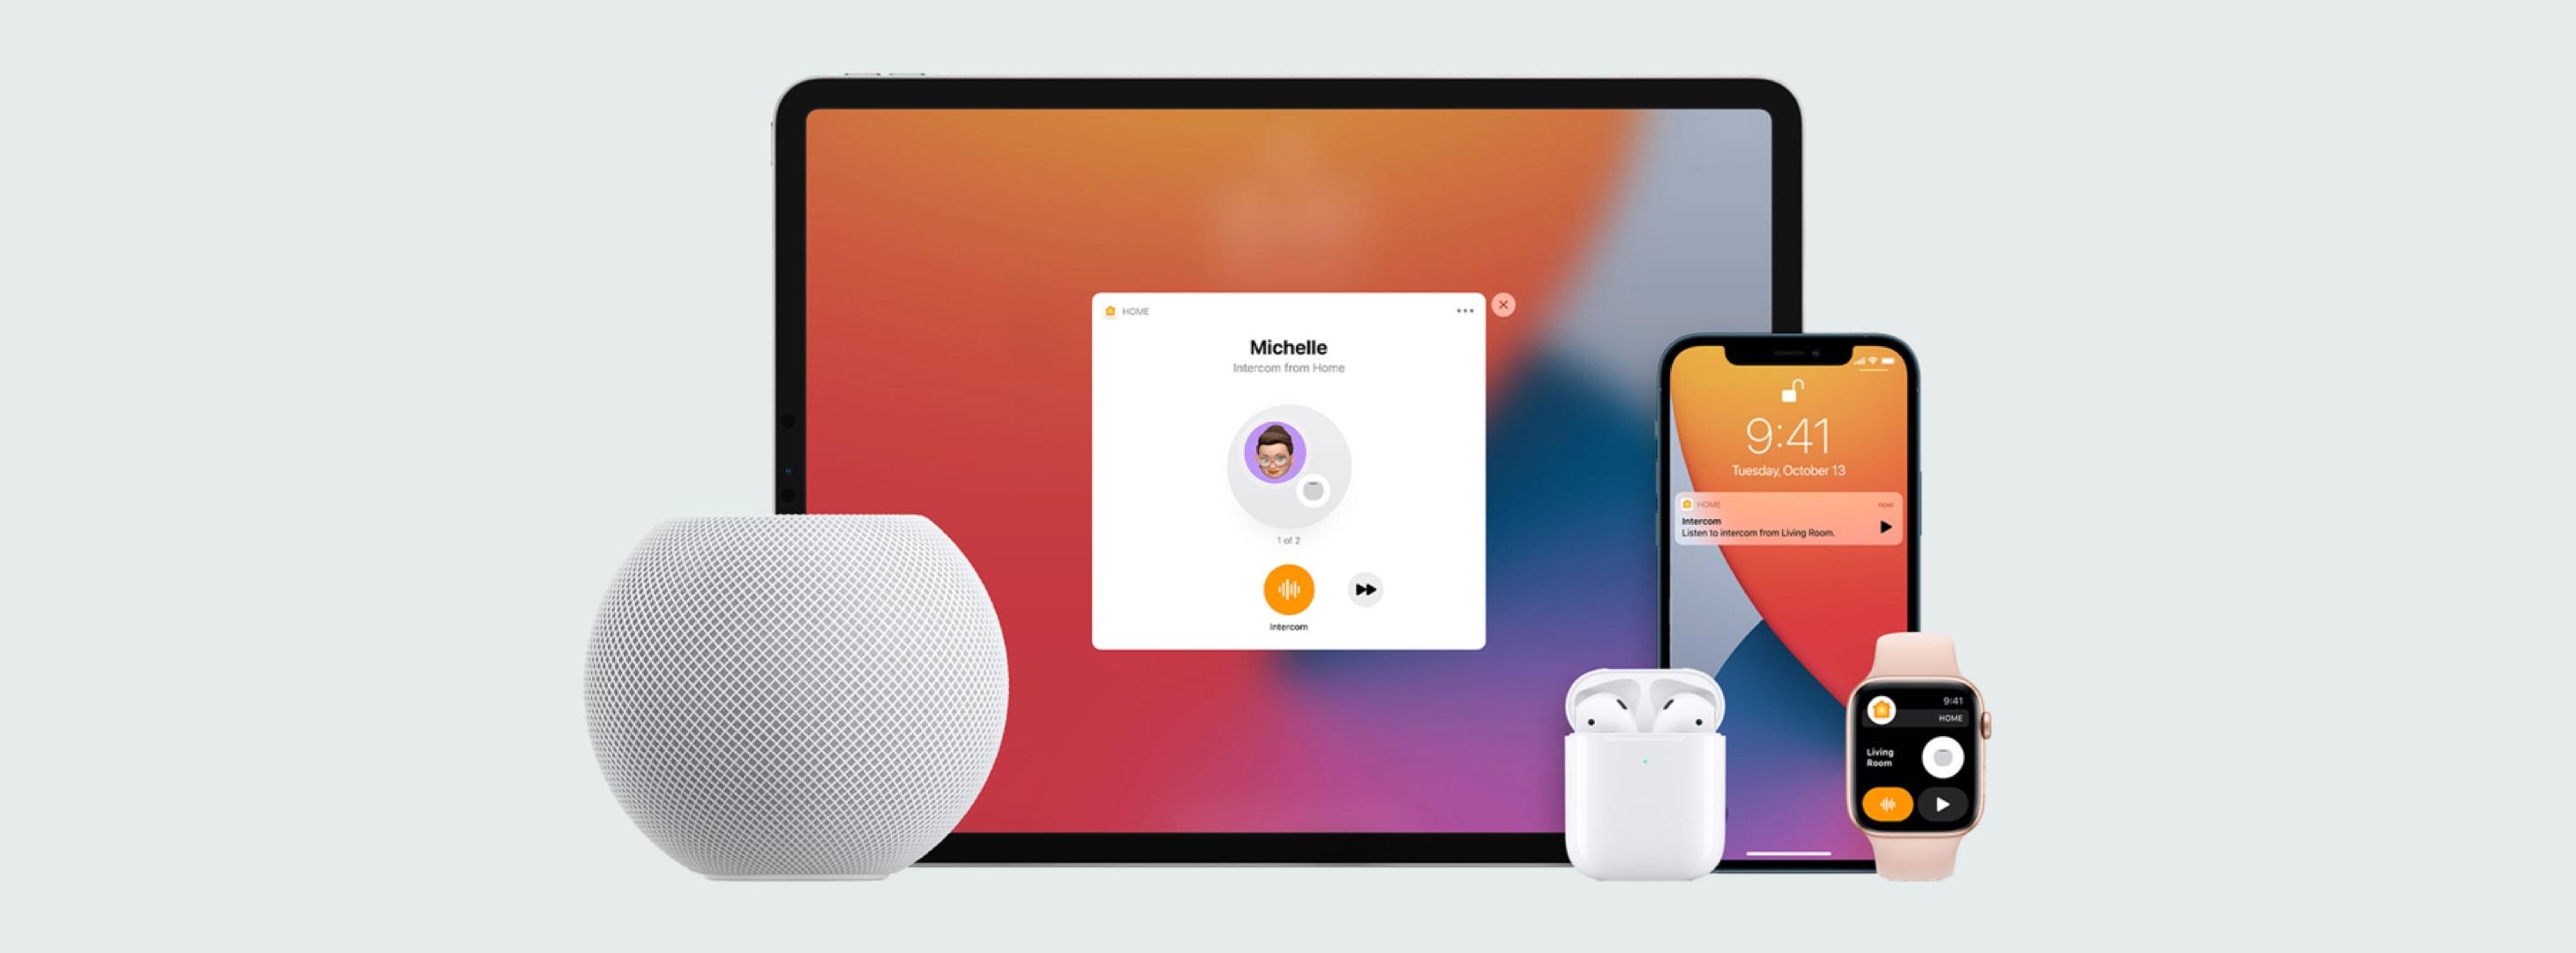 allapplenews-homepod-mini-home-app